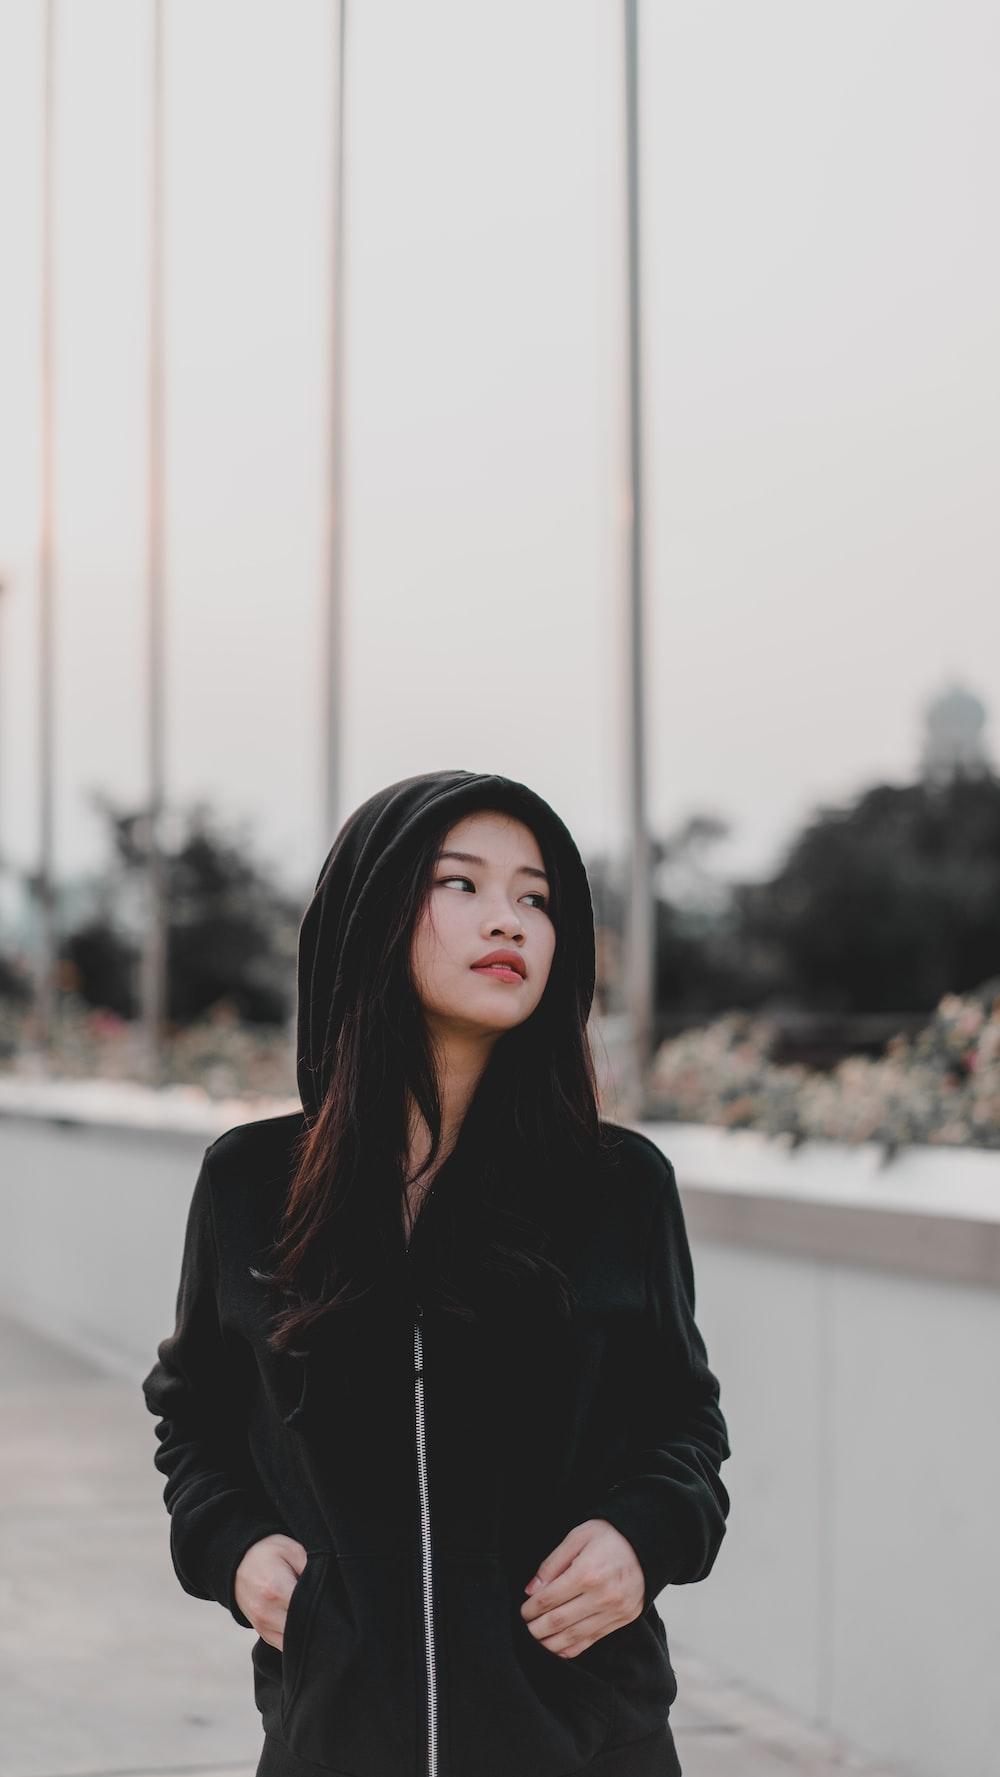 woman wearing black hooded jacket standing outdoor